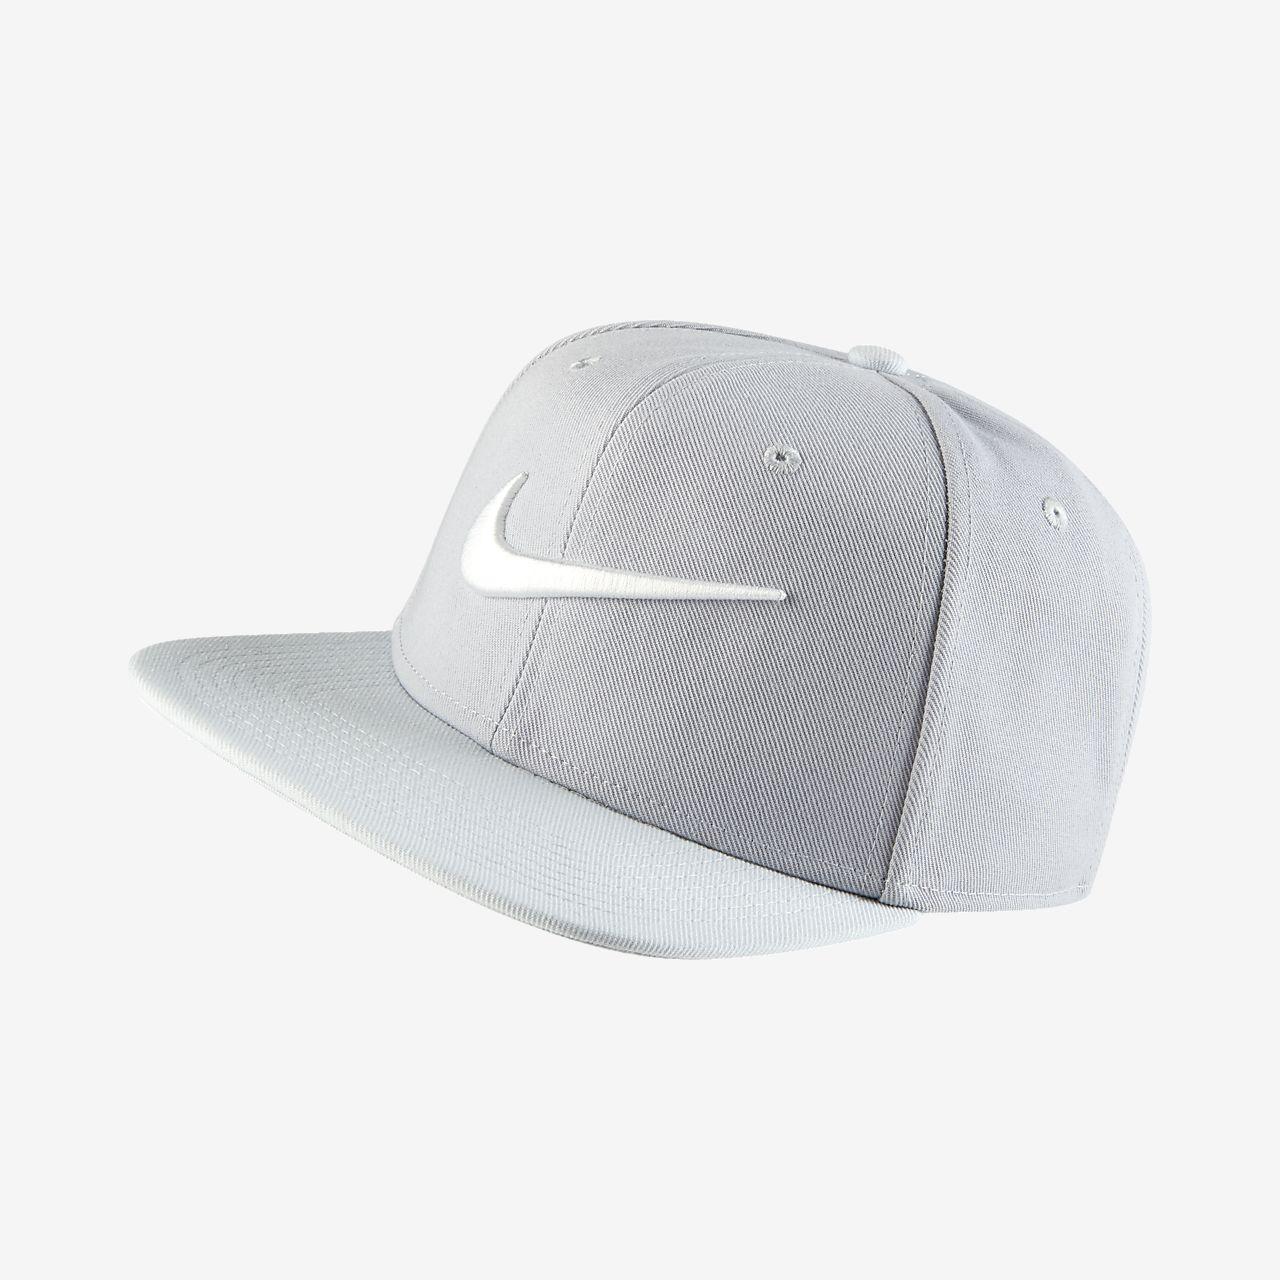 ac3b4bf8bac81 Nike Sportswear Pro Swoosh Adjustable Hat. Nike.com